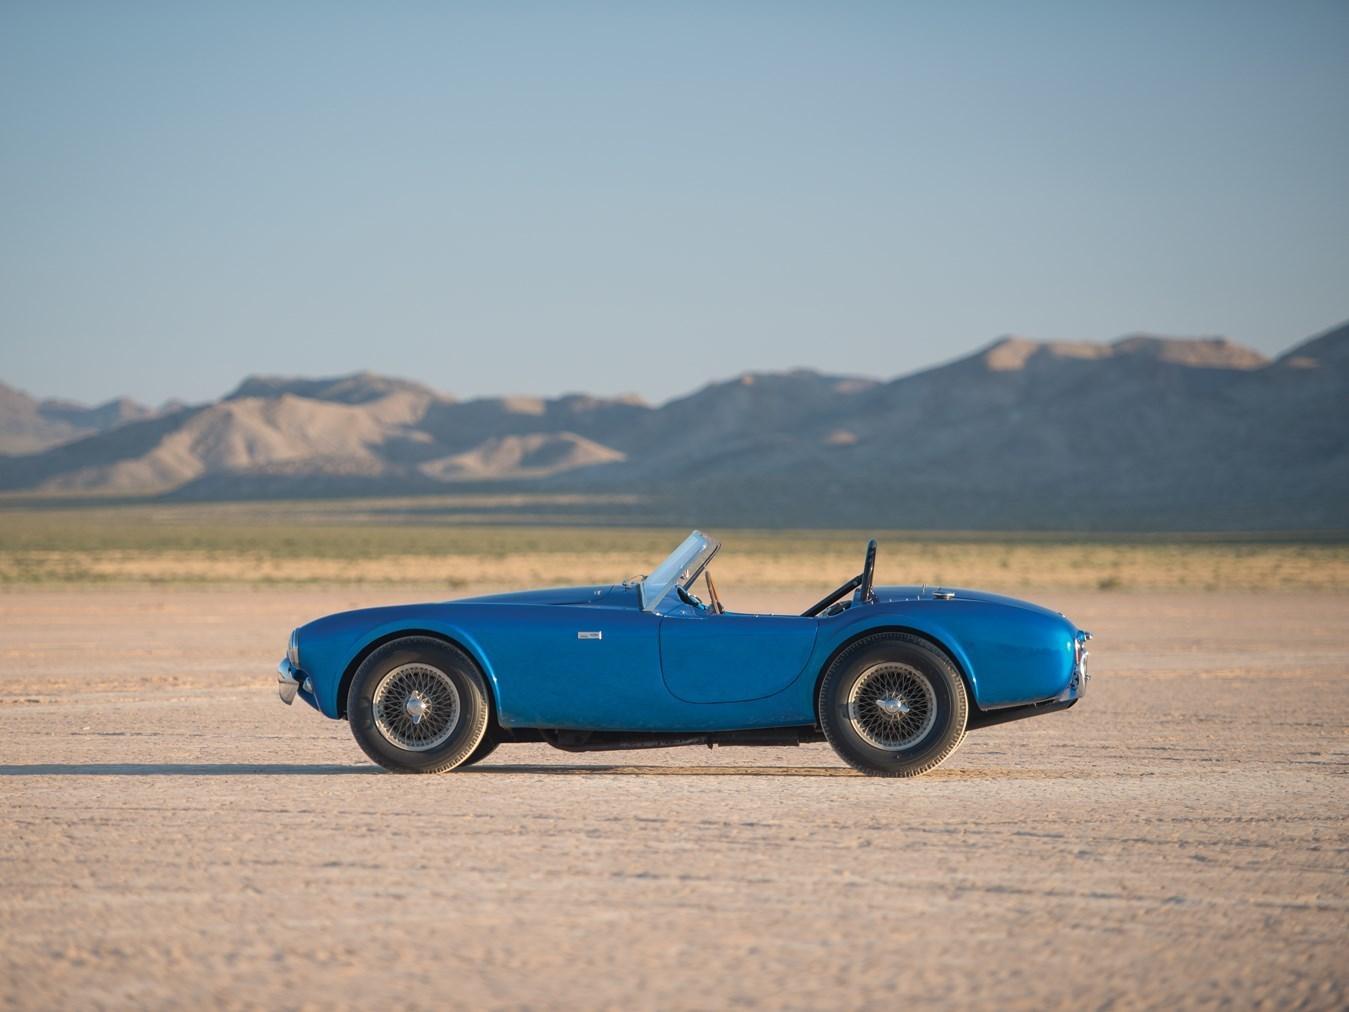 Эксклюзивный Shelby Cobra продан на аукционе за почти $14 млн 2